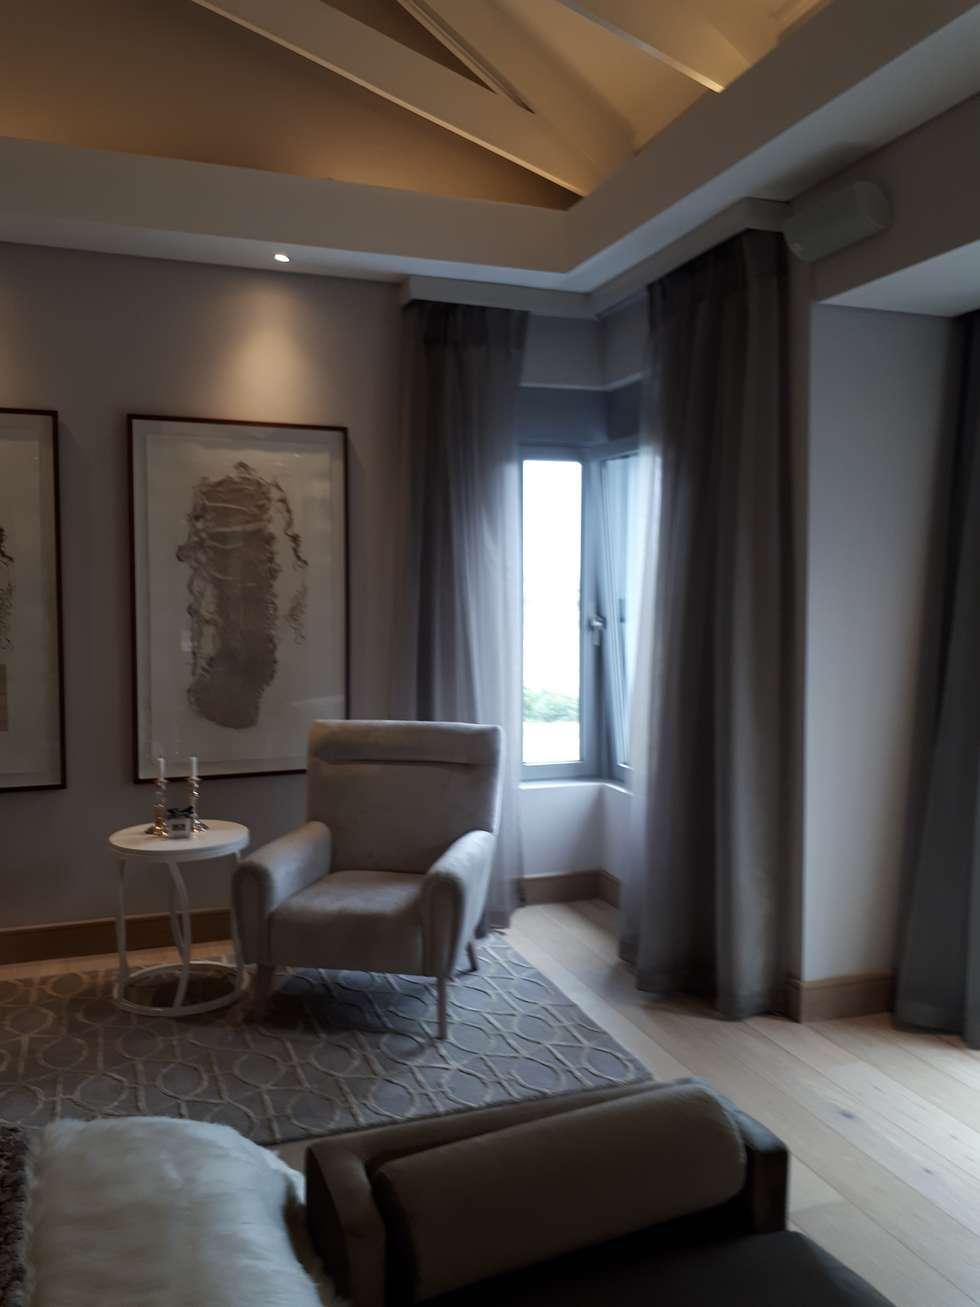 Bedroom Sheer Curtains and Blockout: modern Bedroom by Elliott Designs Studio